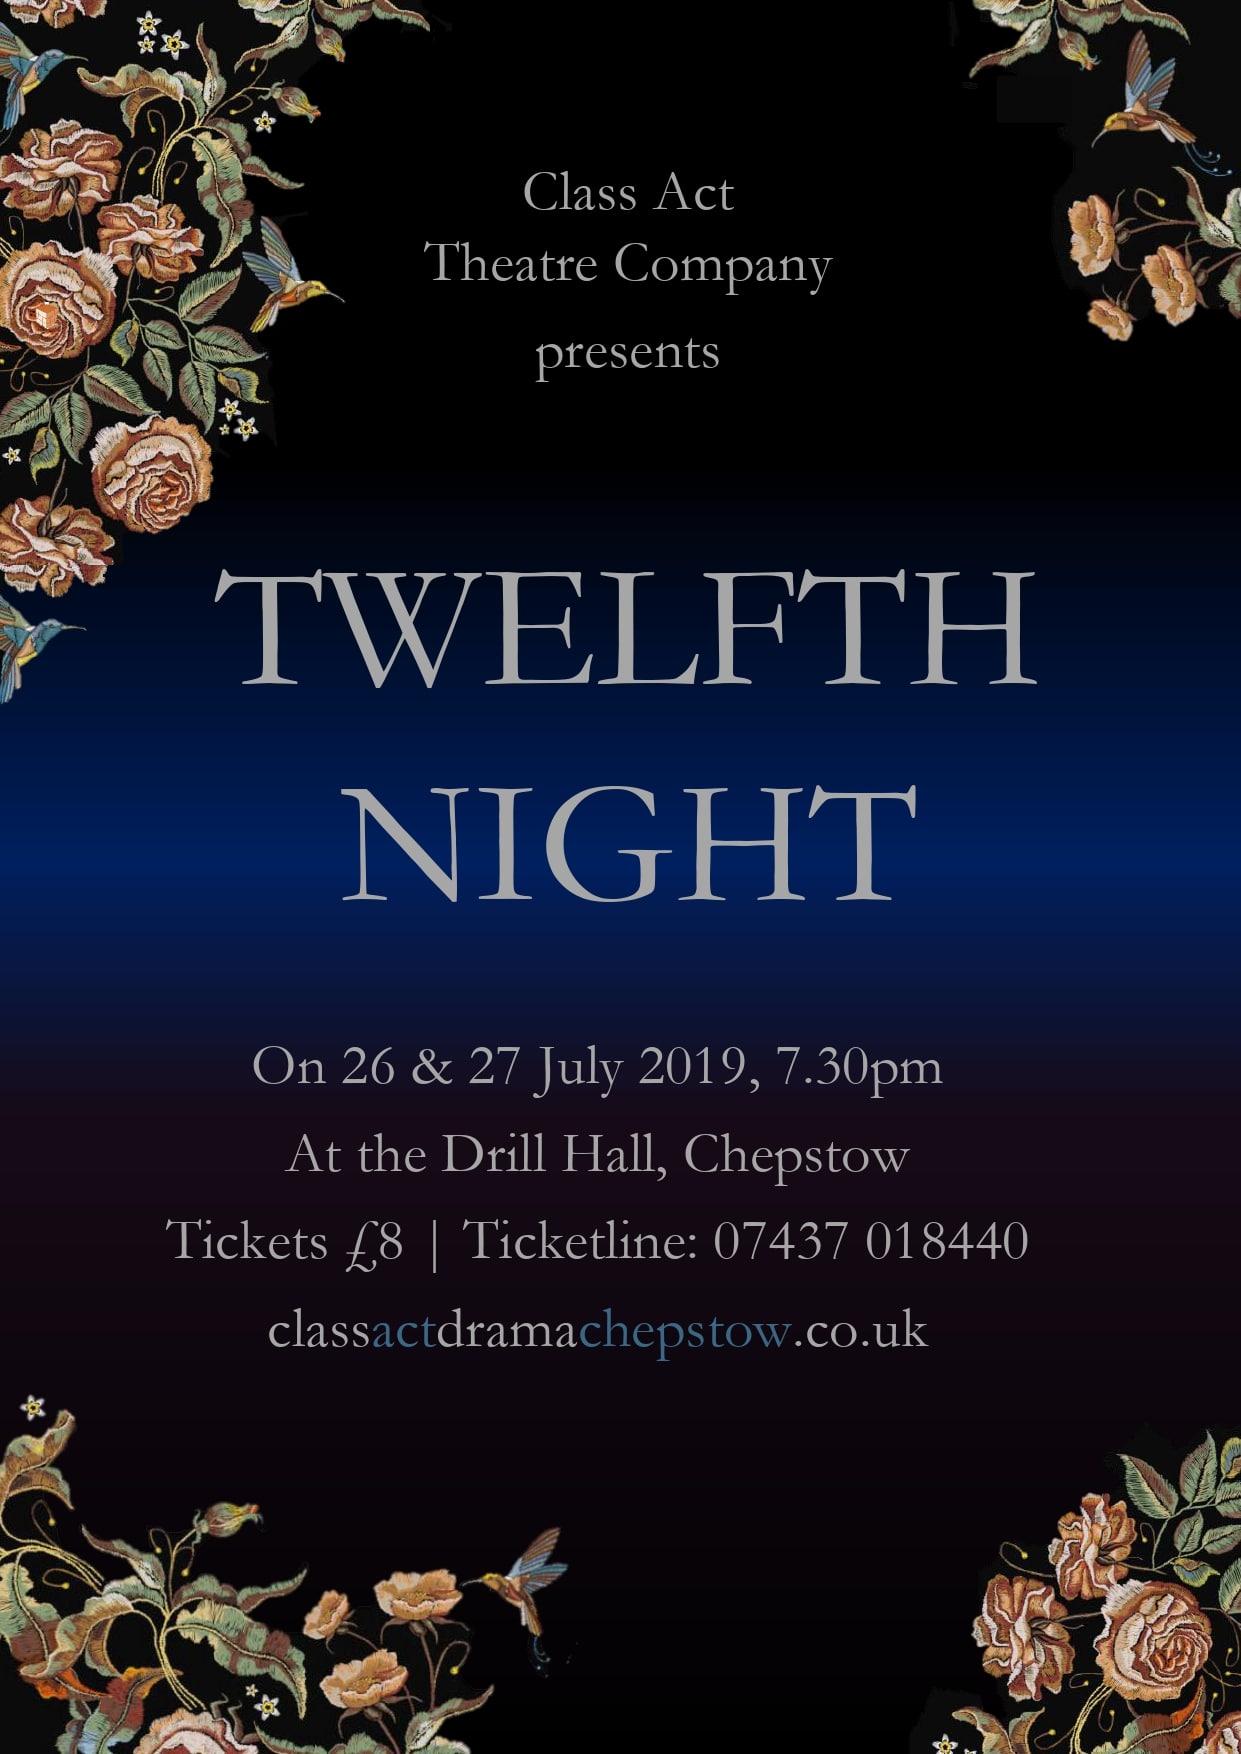 Twelfth Night banner image